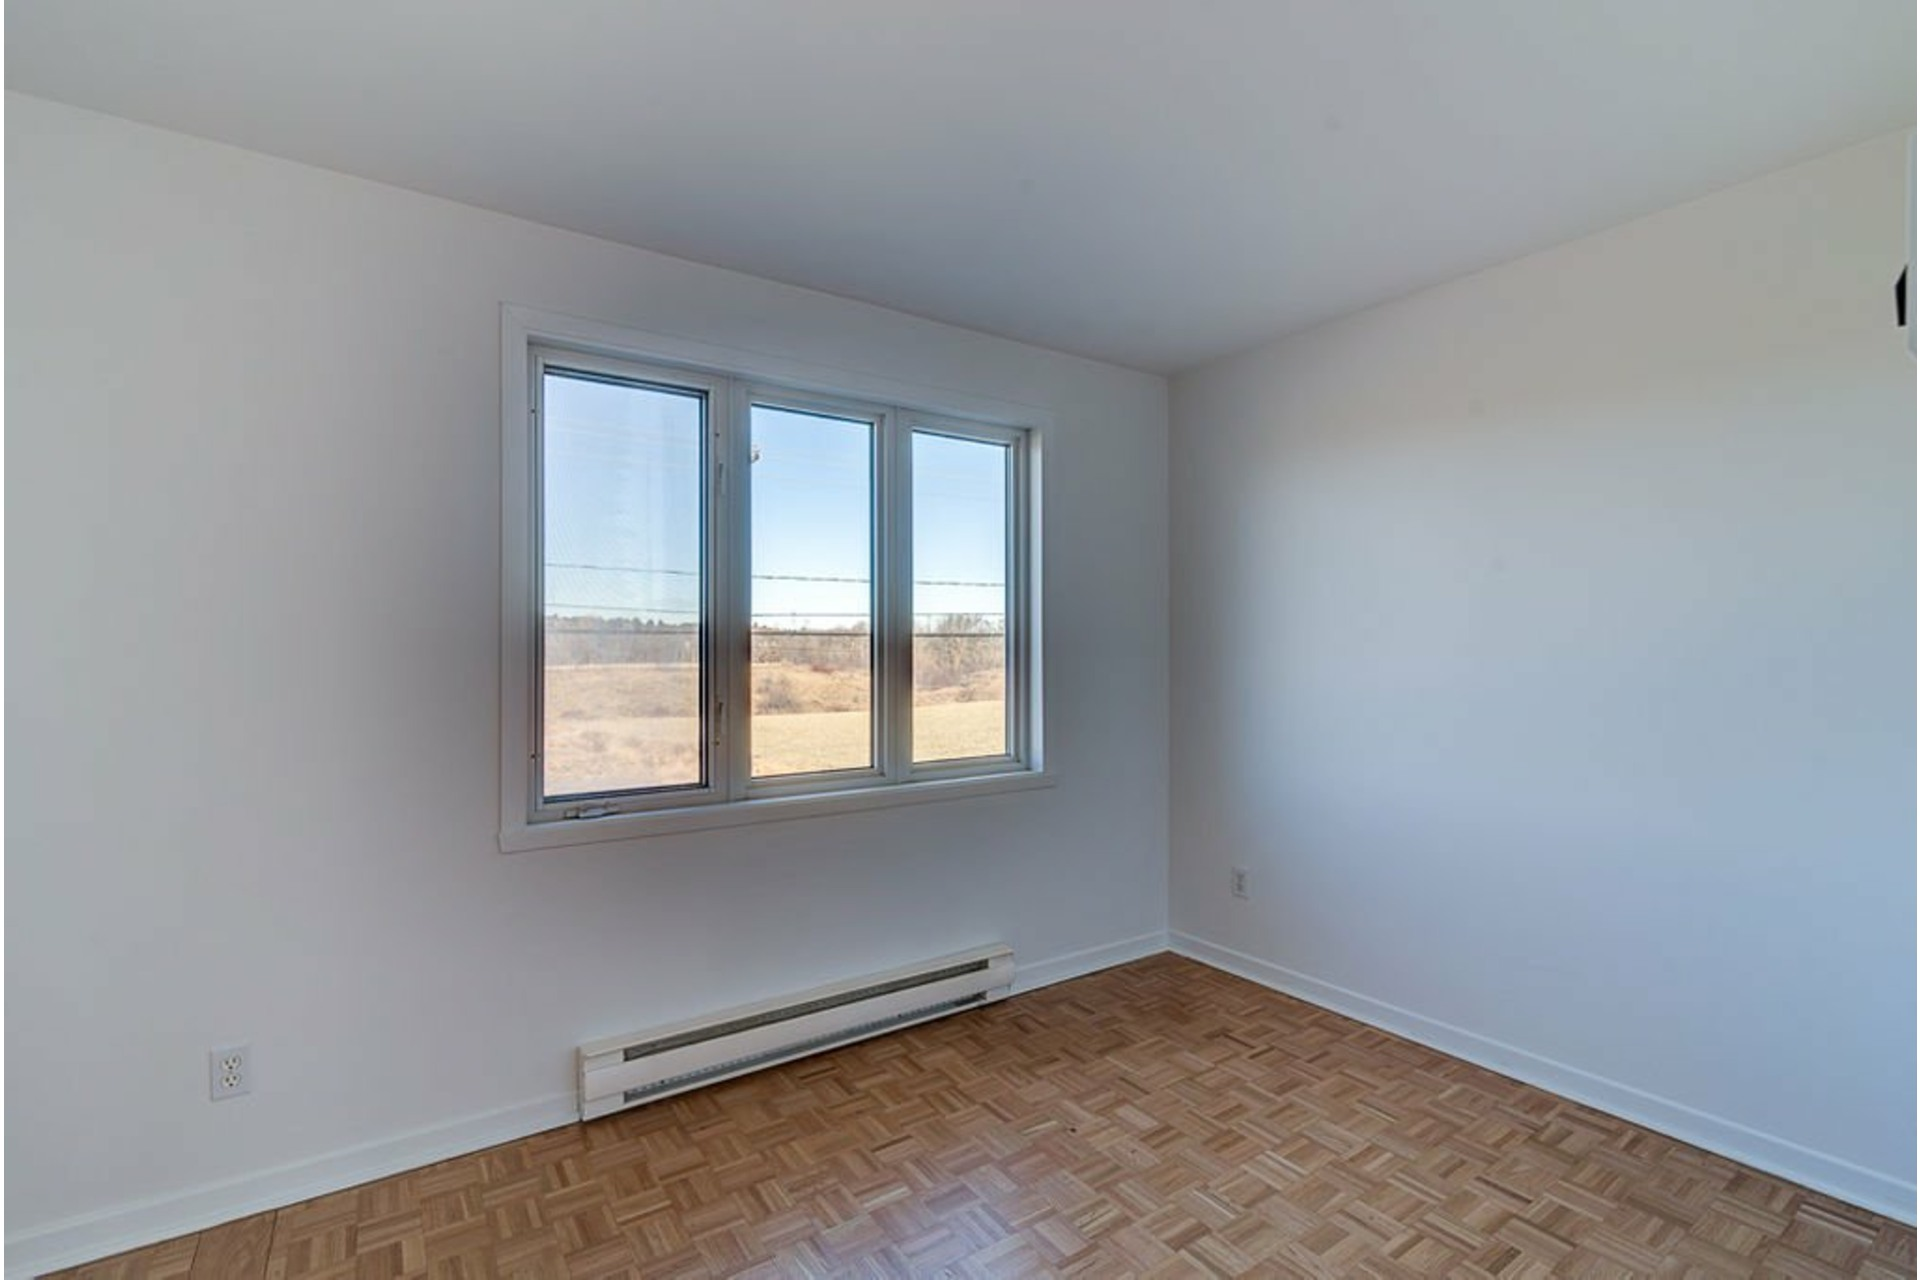 image 22 - House For sale Terrebonne Terrebonne  - 11 rooms